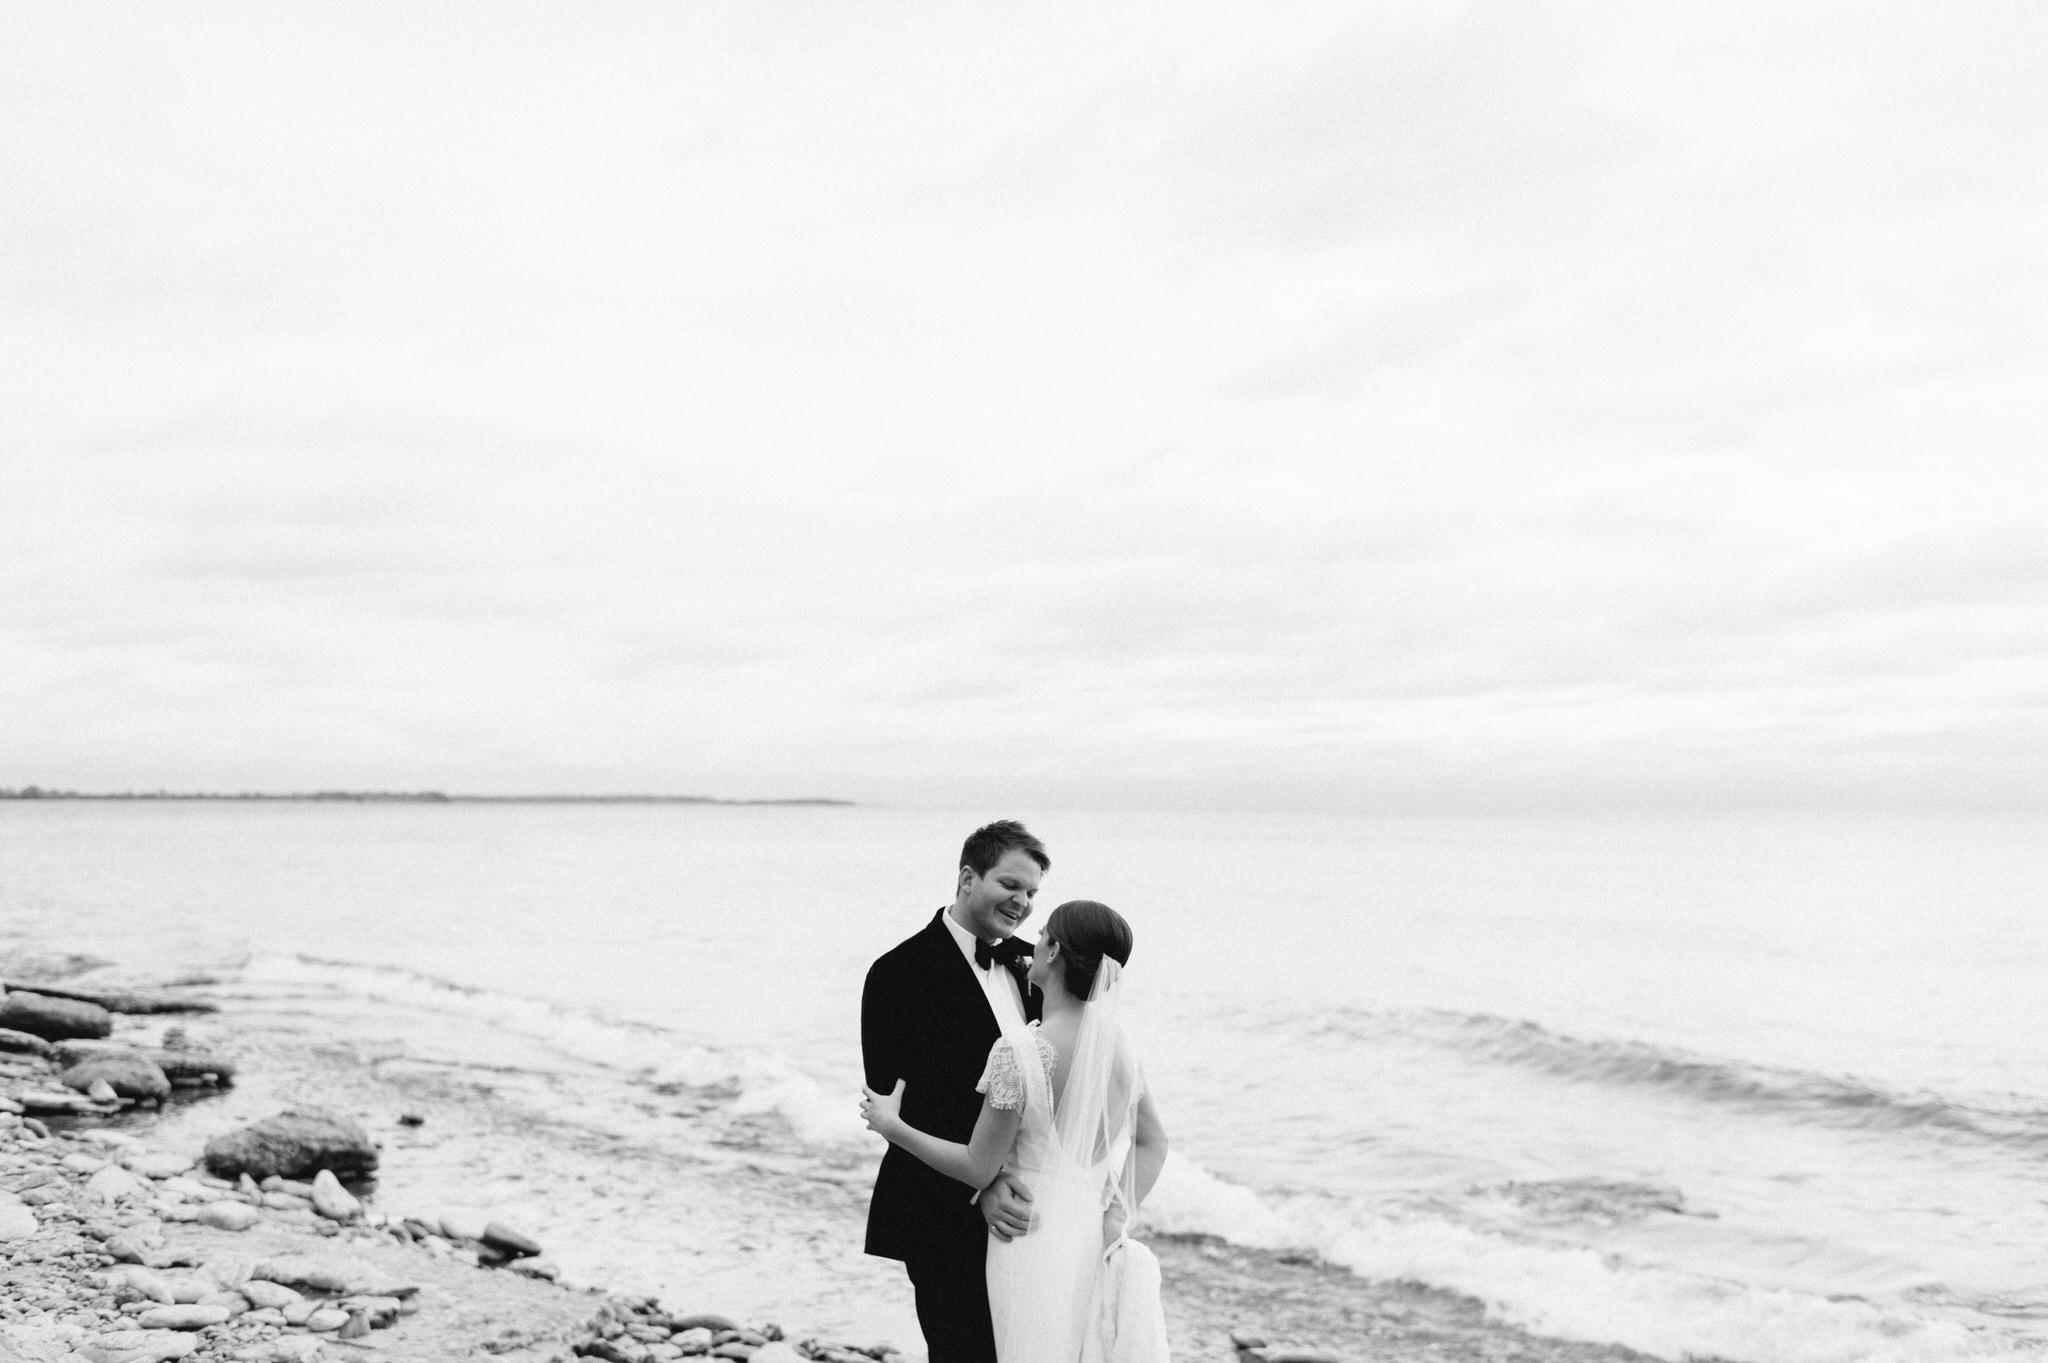 scarletoneillphotography_weddingphotography_prince edward county weddings041.JPG